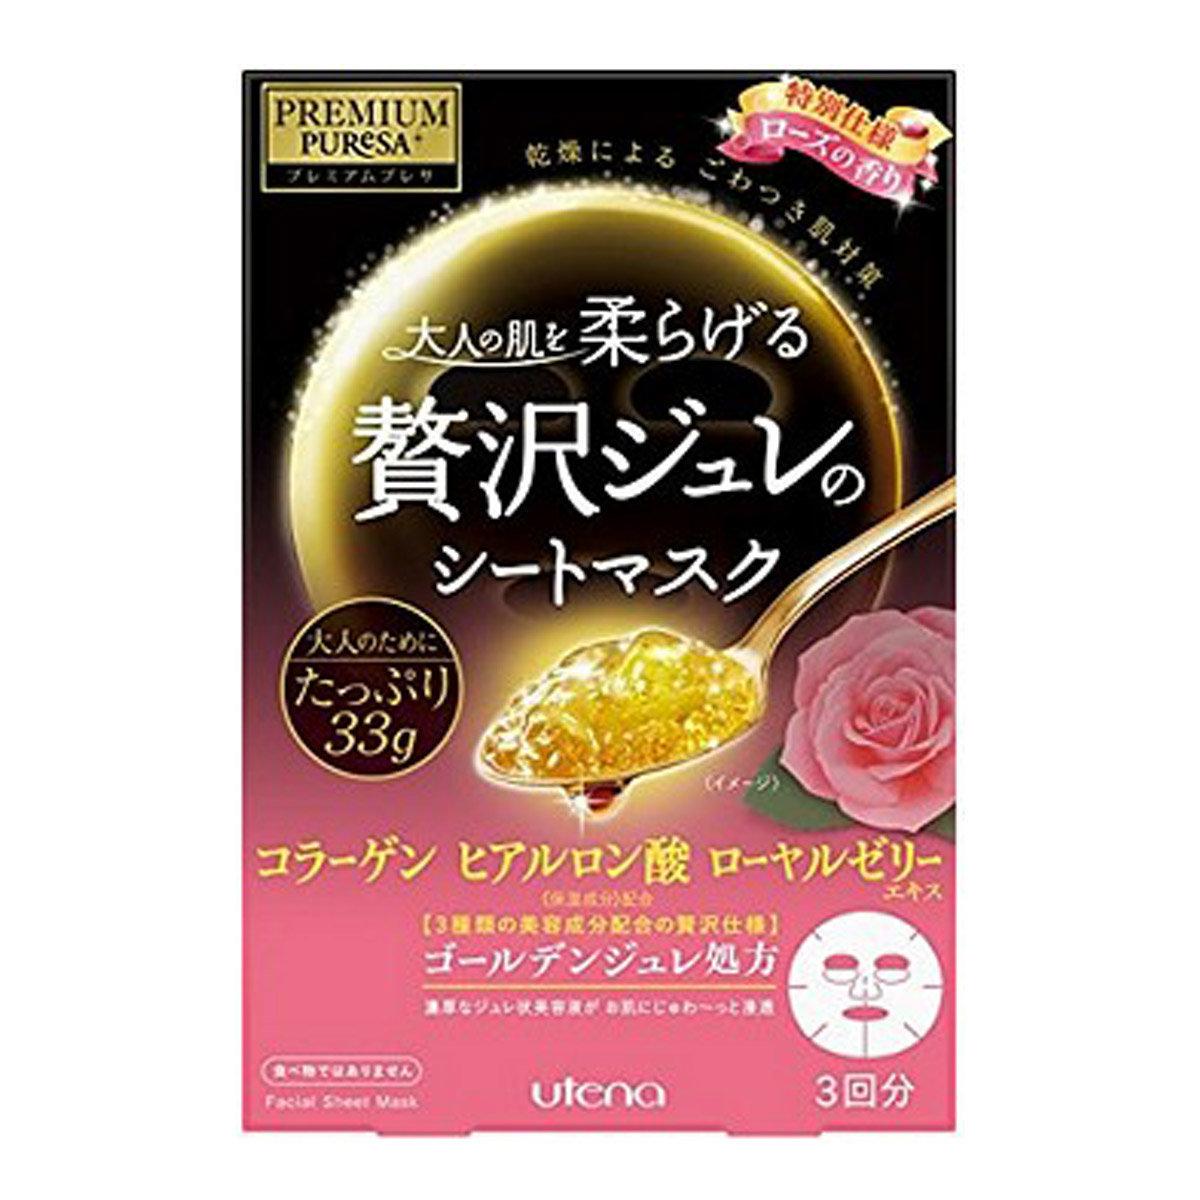 Utena Premium Puresa 佑天娜 普麗莎 玫瑰精華果凍面膜 限量版33g (1盒3片) 玫瑰粉盒